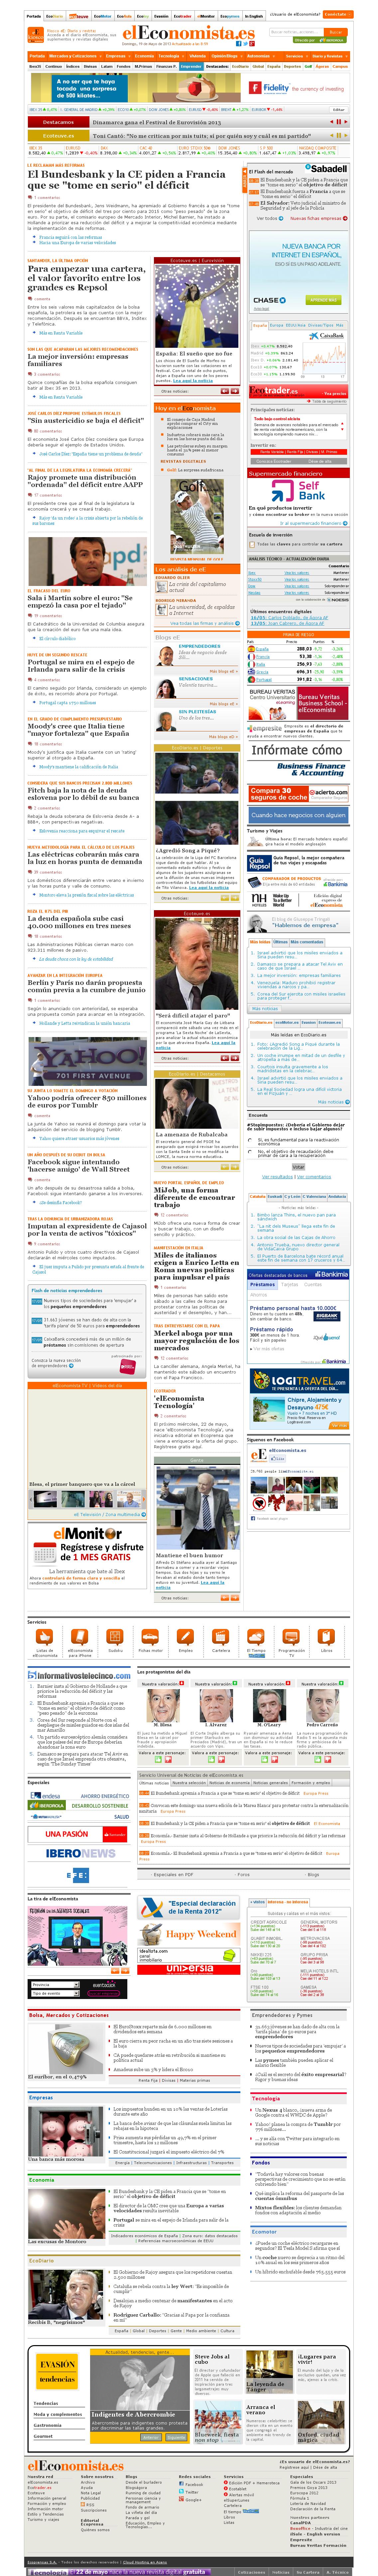 elEconomista at Sunday May 19, 2013, 7:05 a.m. UTC